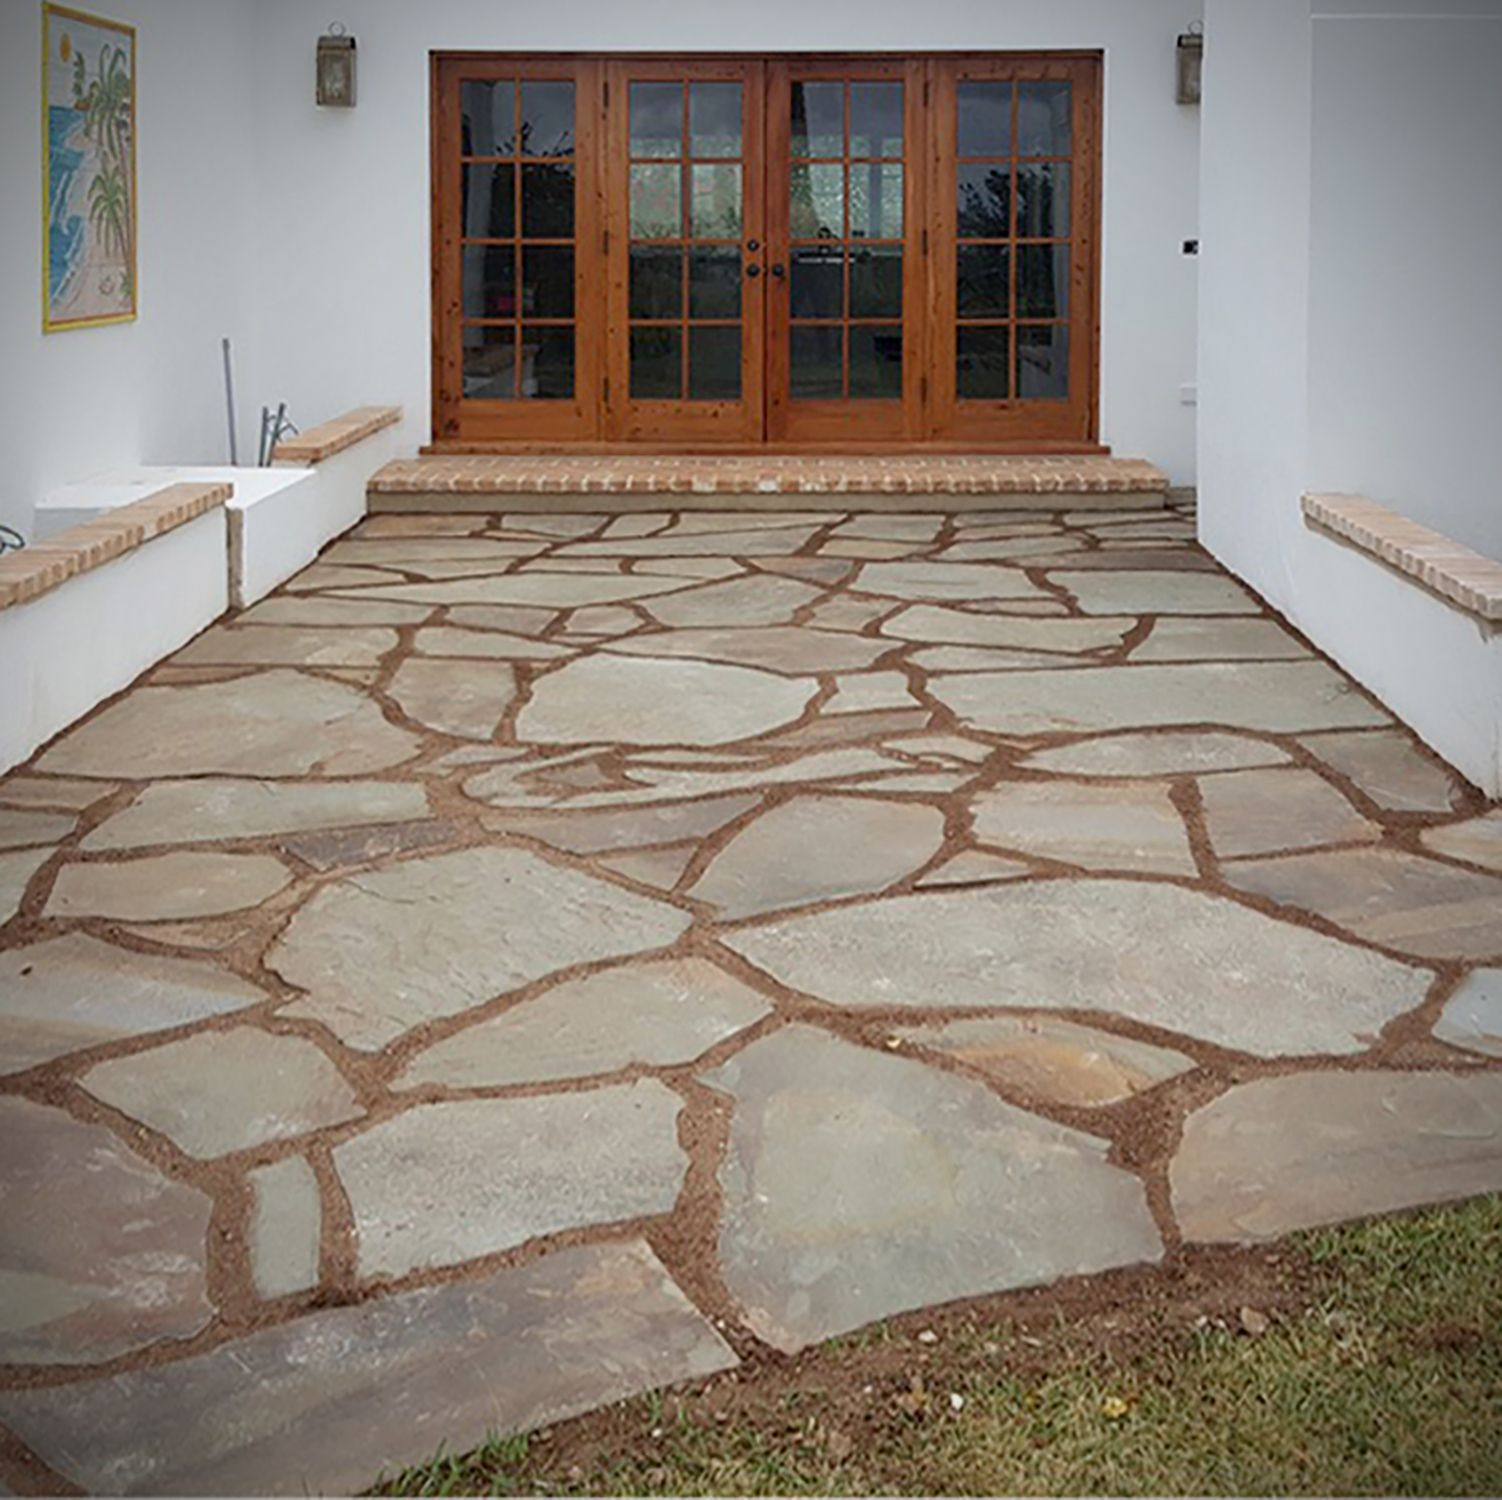 Bluestone Flagstone Pathway & Patio Stone Entry - Natural Stone Pavers & Landscape Stone